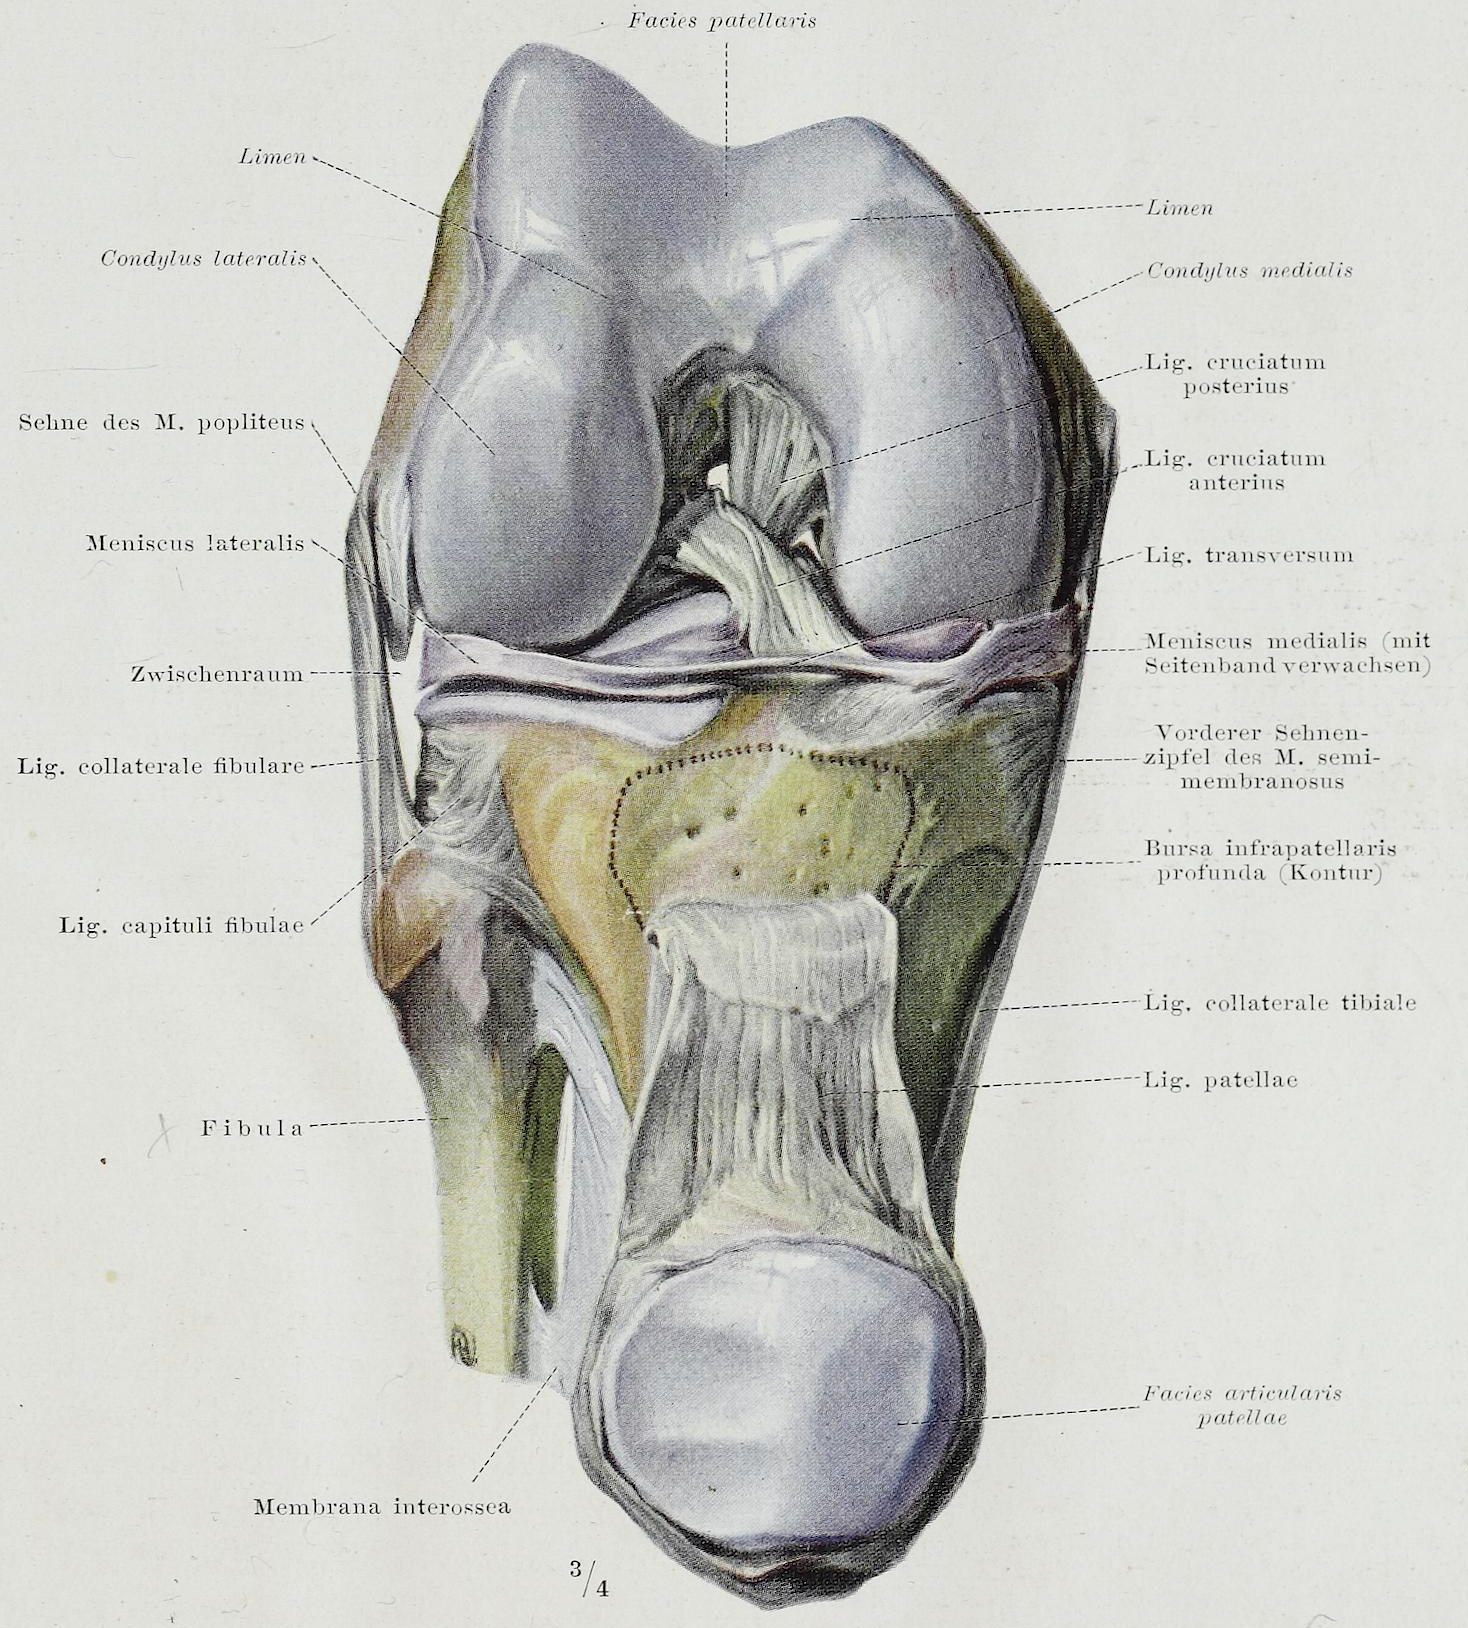 Groß Hinterhaupts Kondylus Anatomie Fotos - Anatomie Ideen - finotti ...